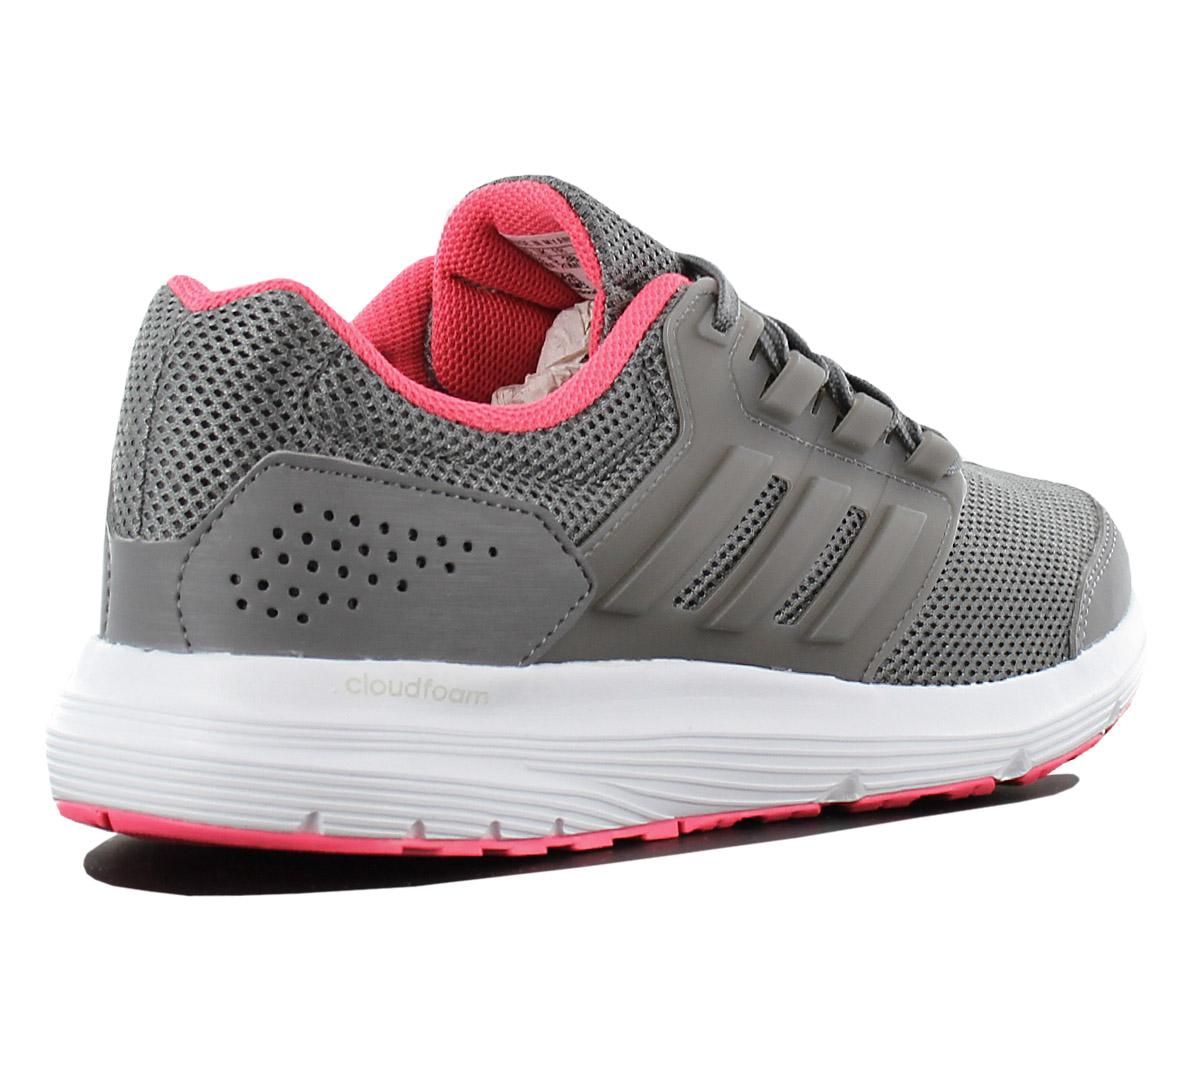 half off e4971 73b61 Adidas Galaxy 4 Women s Running Fitness Shoes Running Sports Shoes ...